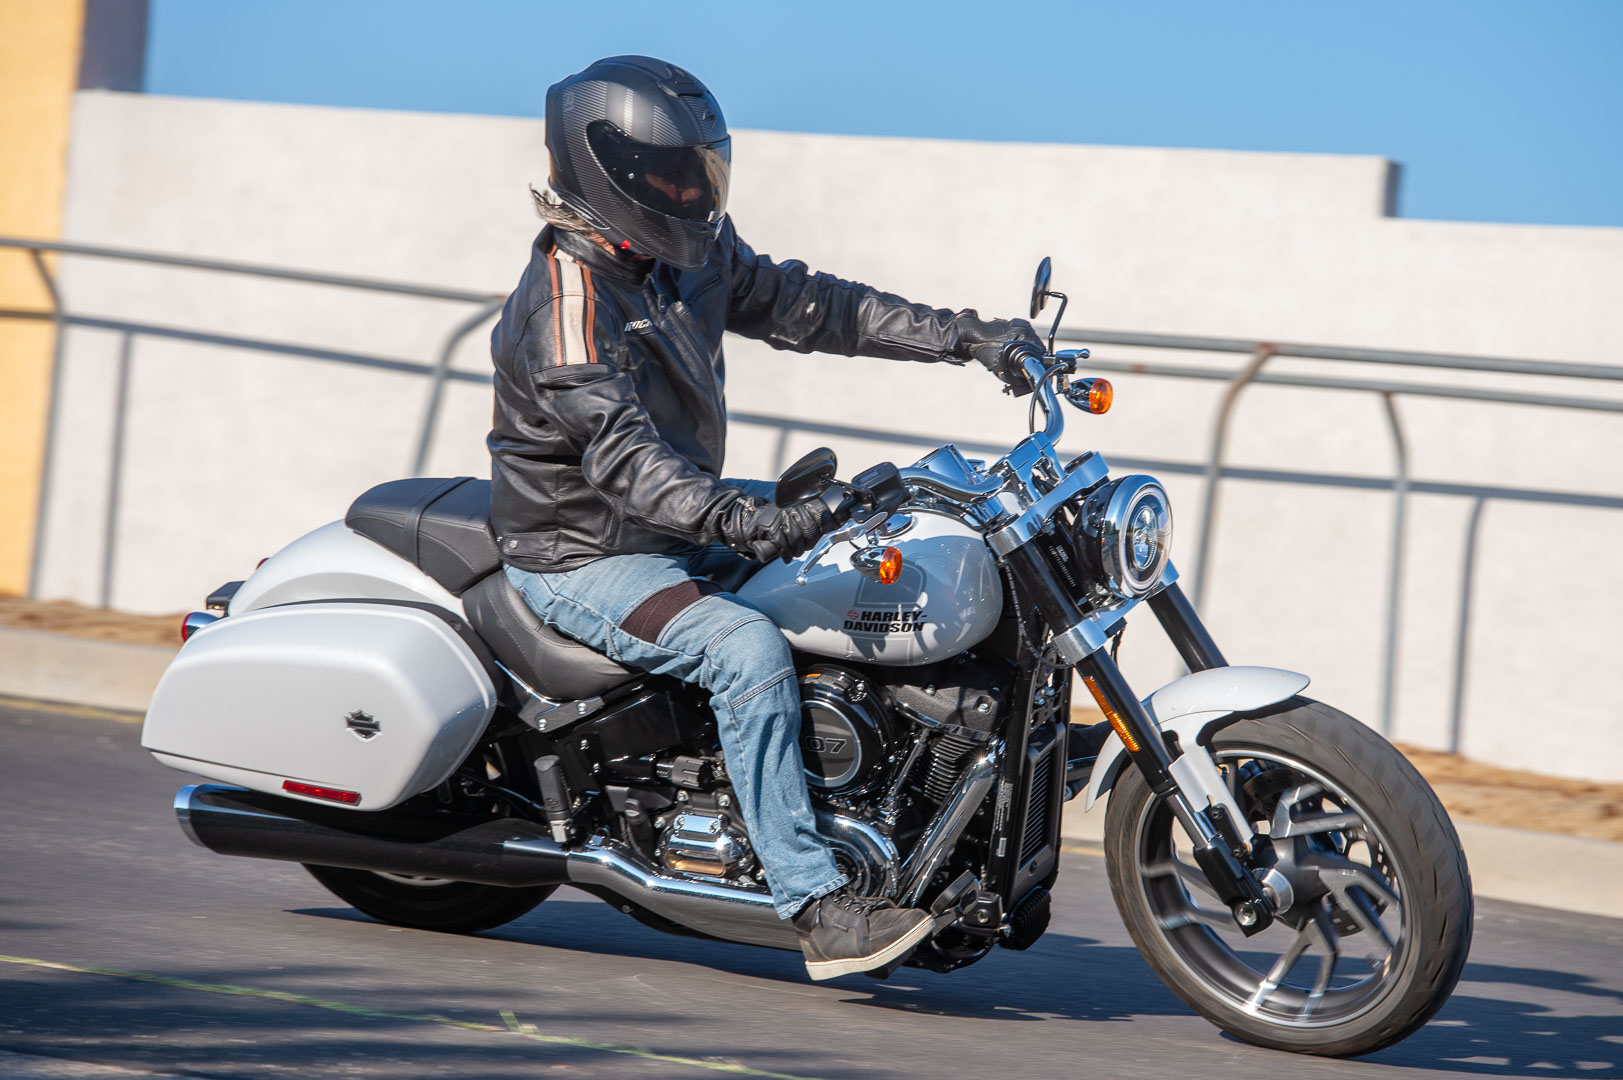 2021 Harley-Davidson Sport Glide